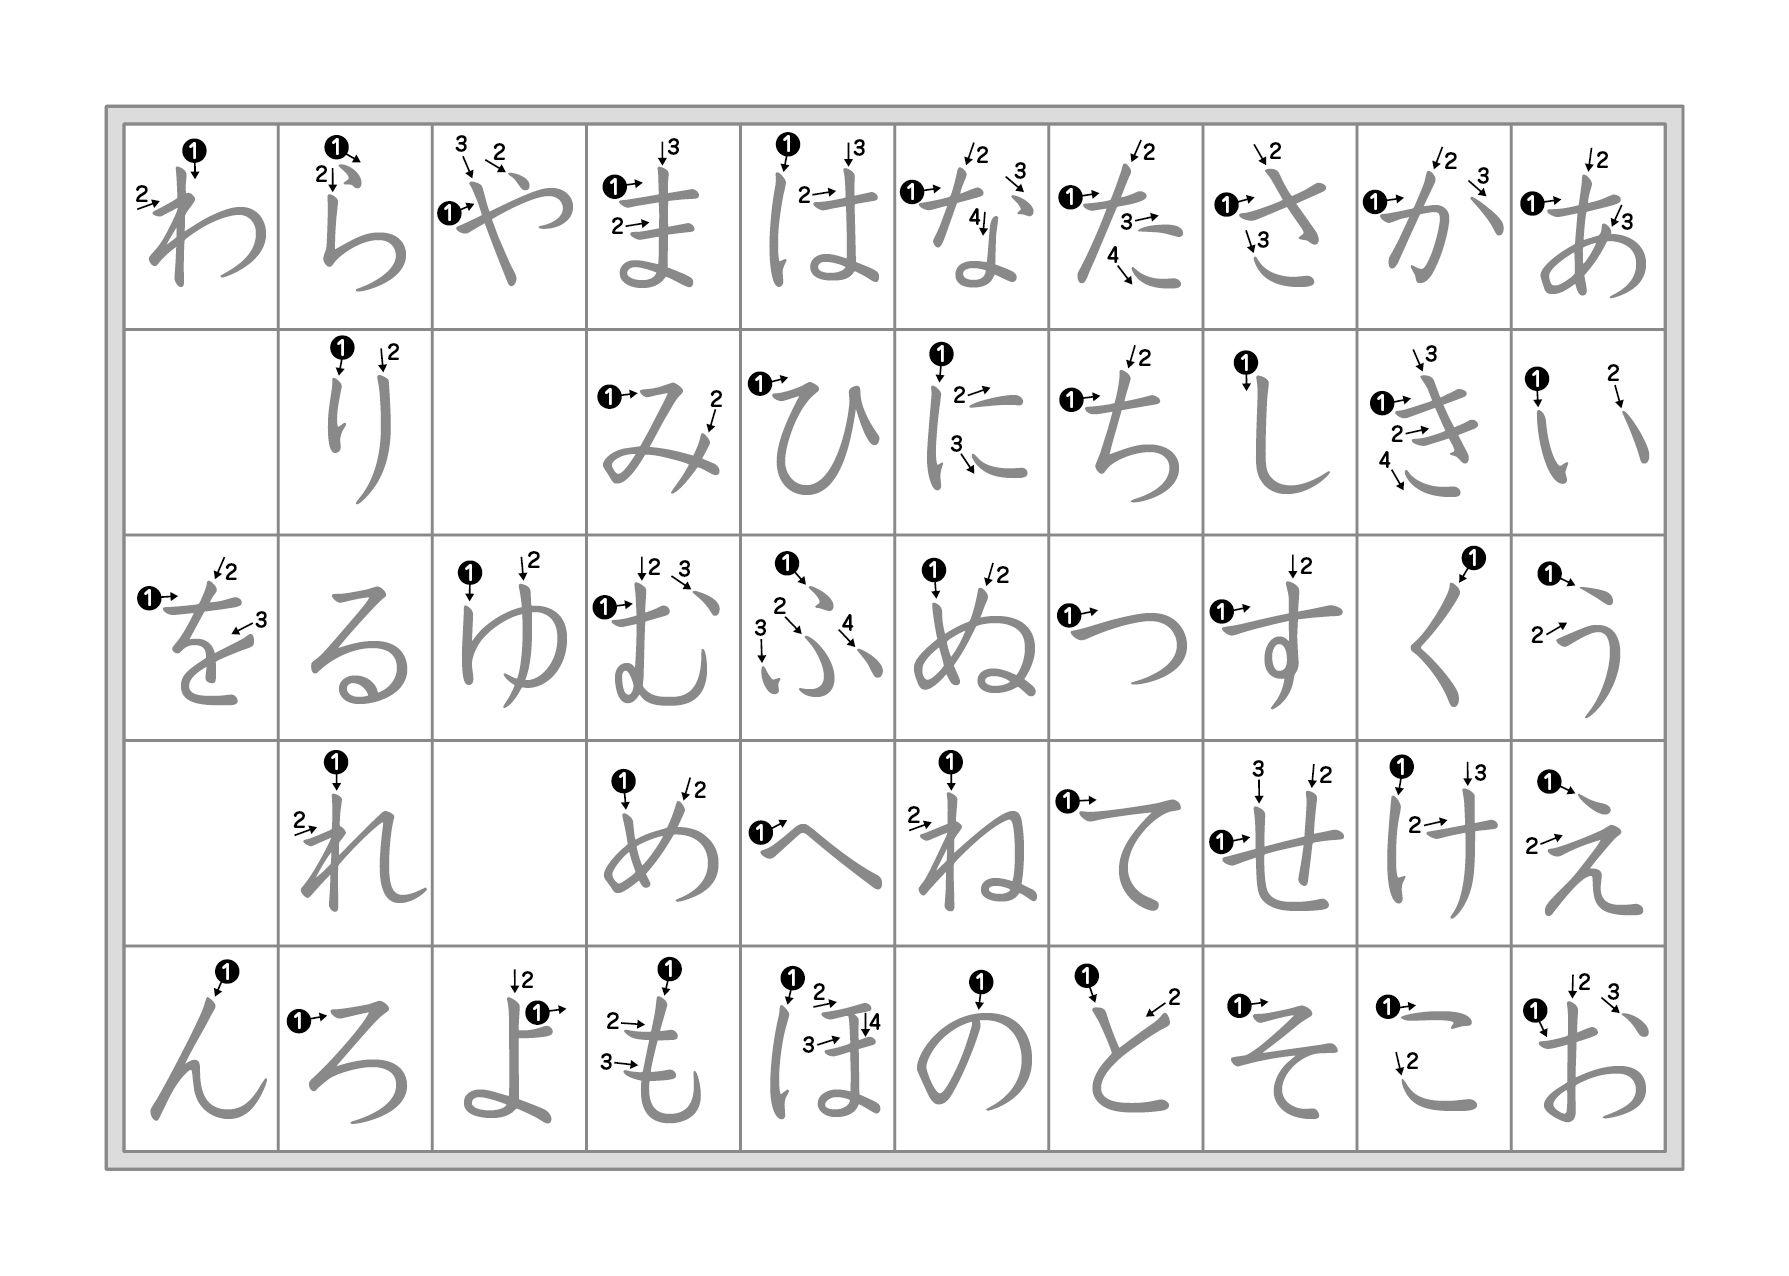 27 Hiragana Charts Stroke Order Practice Mnemonics And More